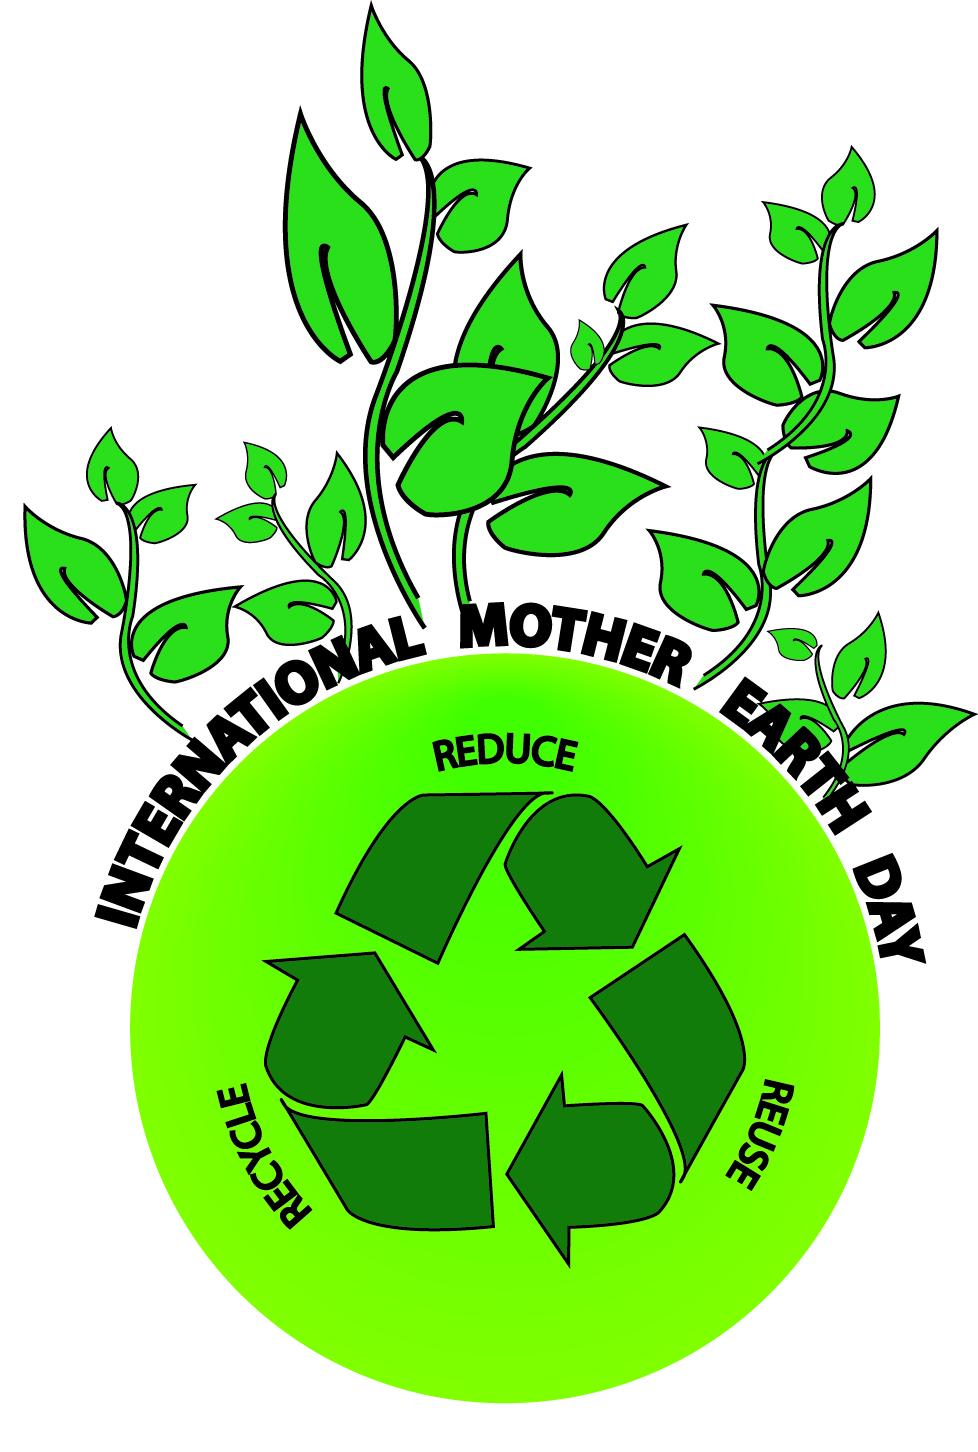 International Mother Earth Day 2012 Xplore Xpress